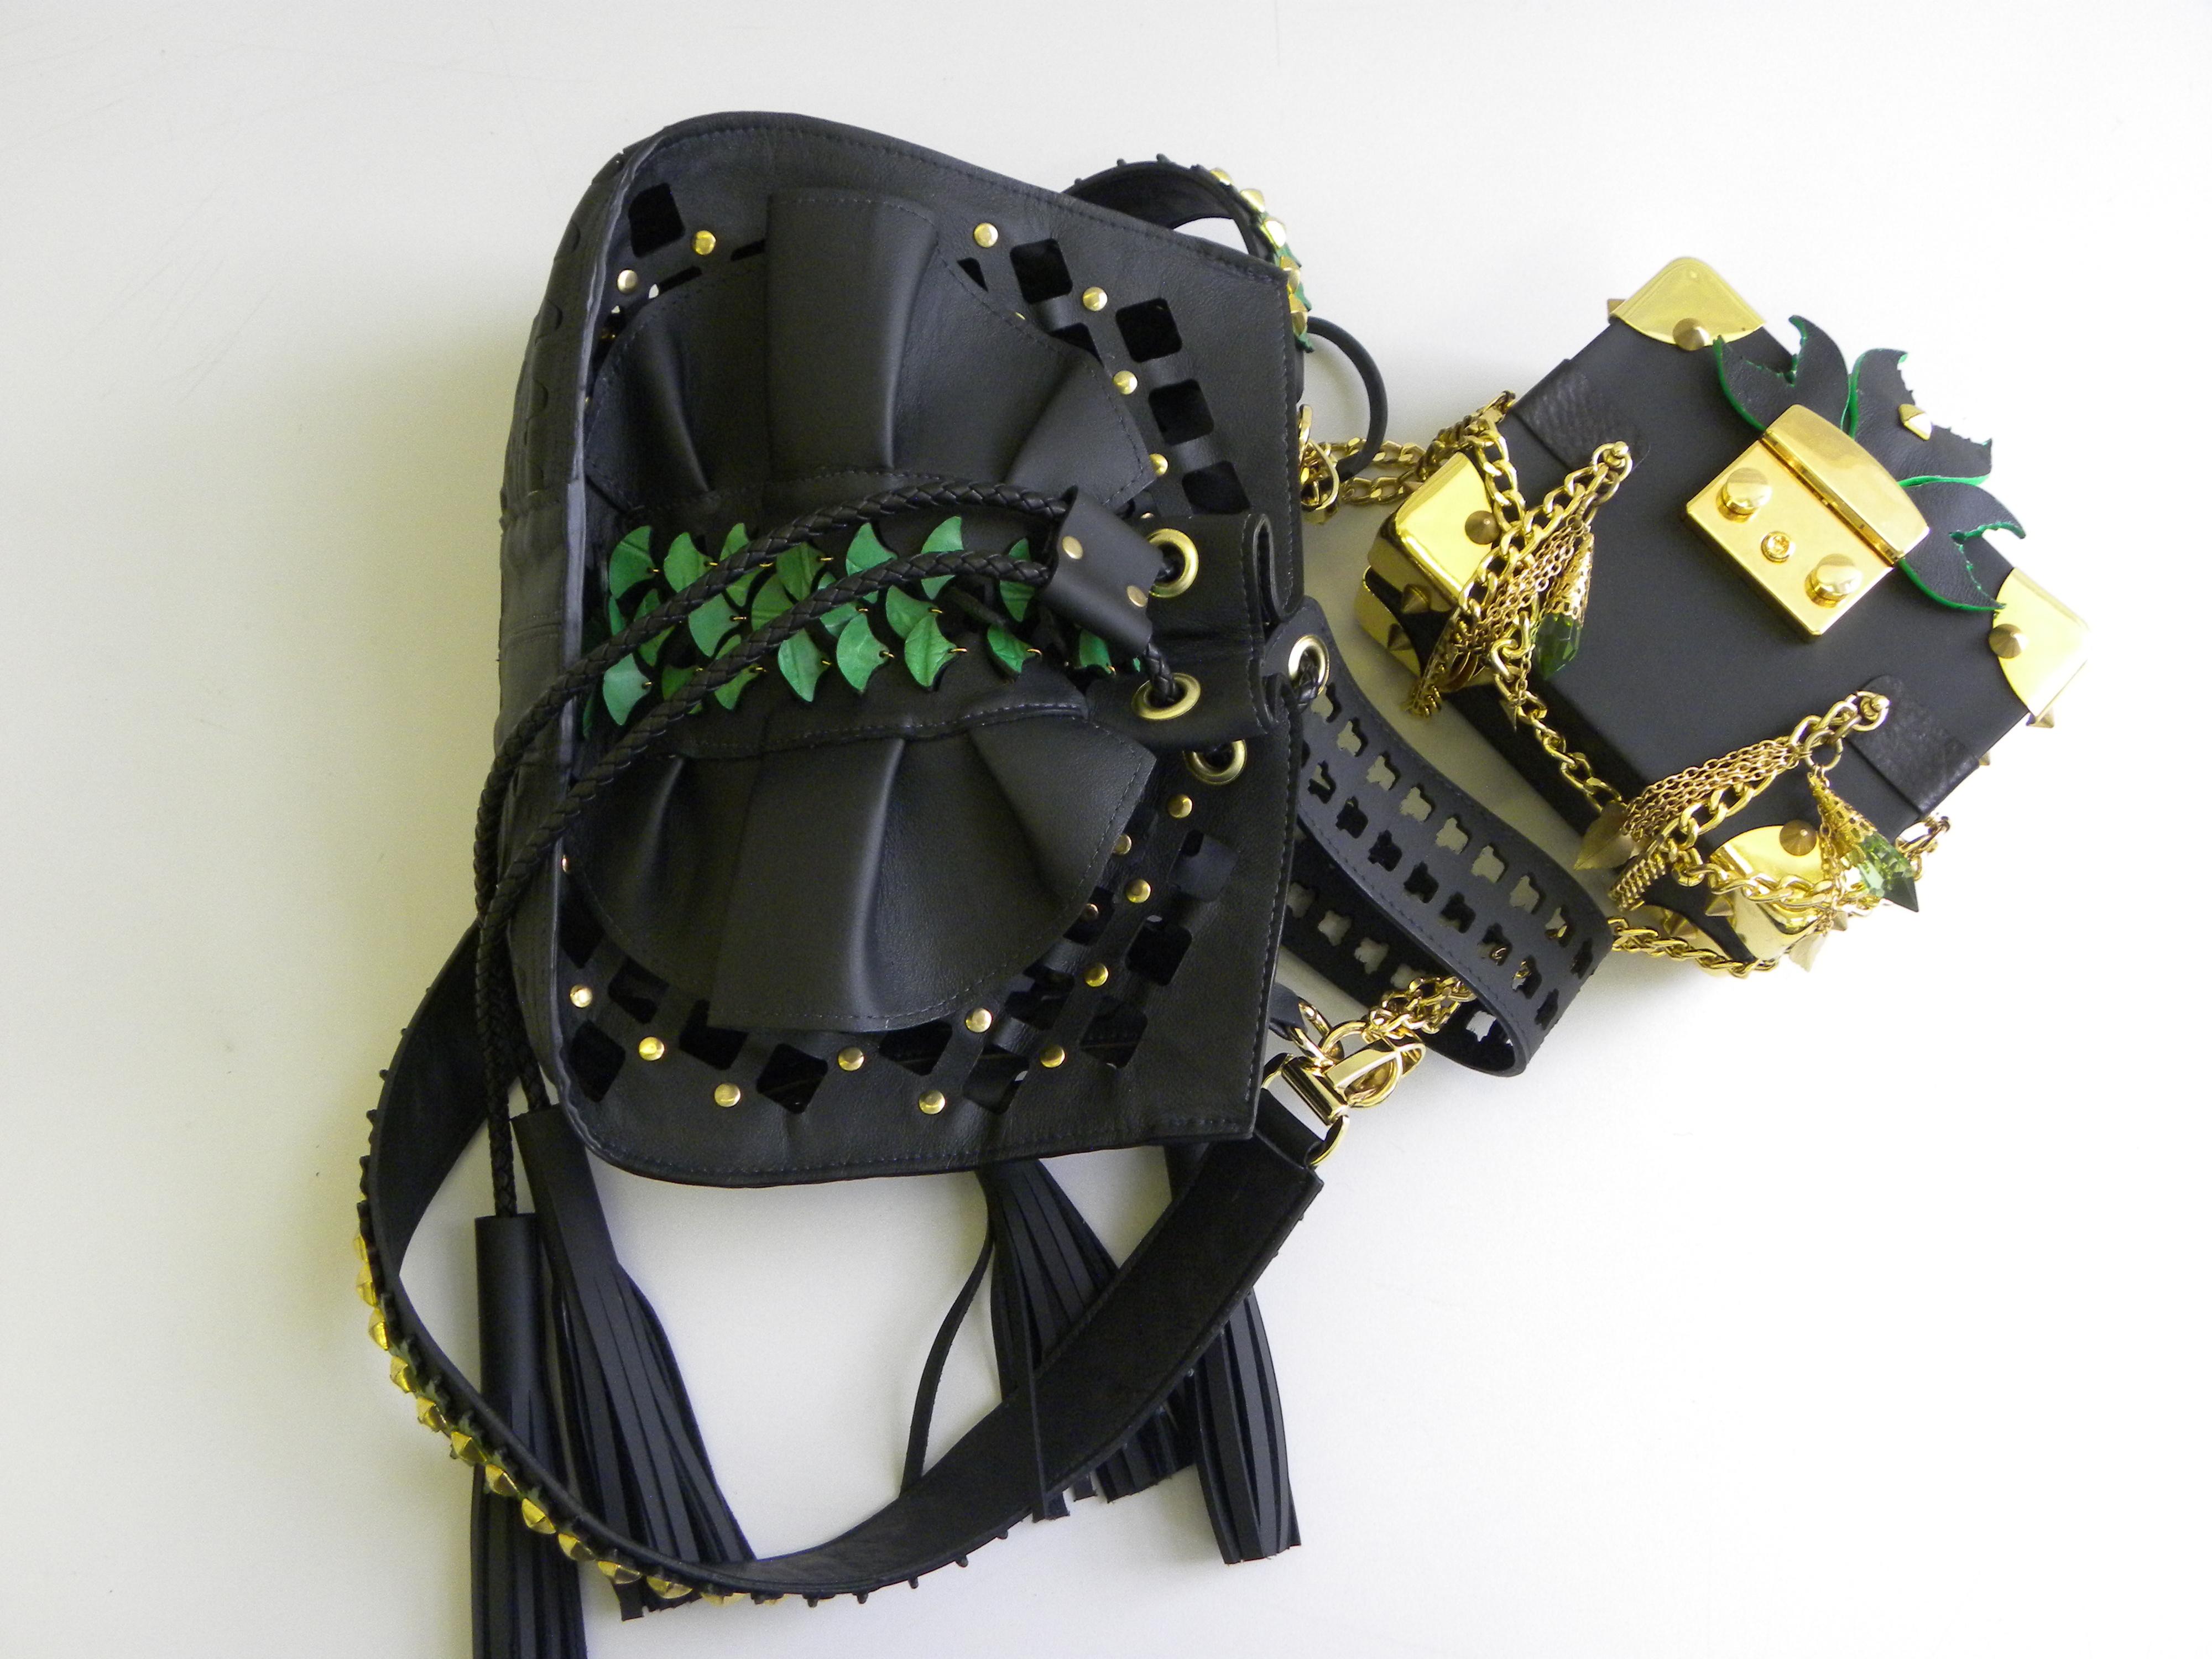 Bag design by second prize winner Zeke Zhang